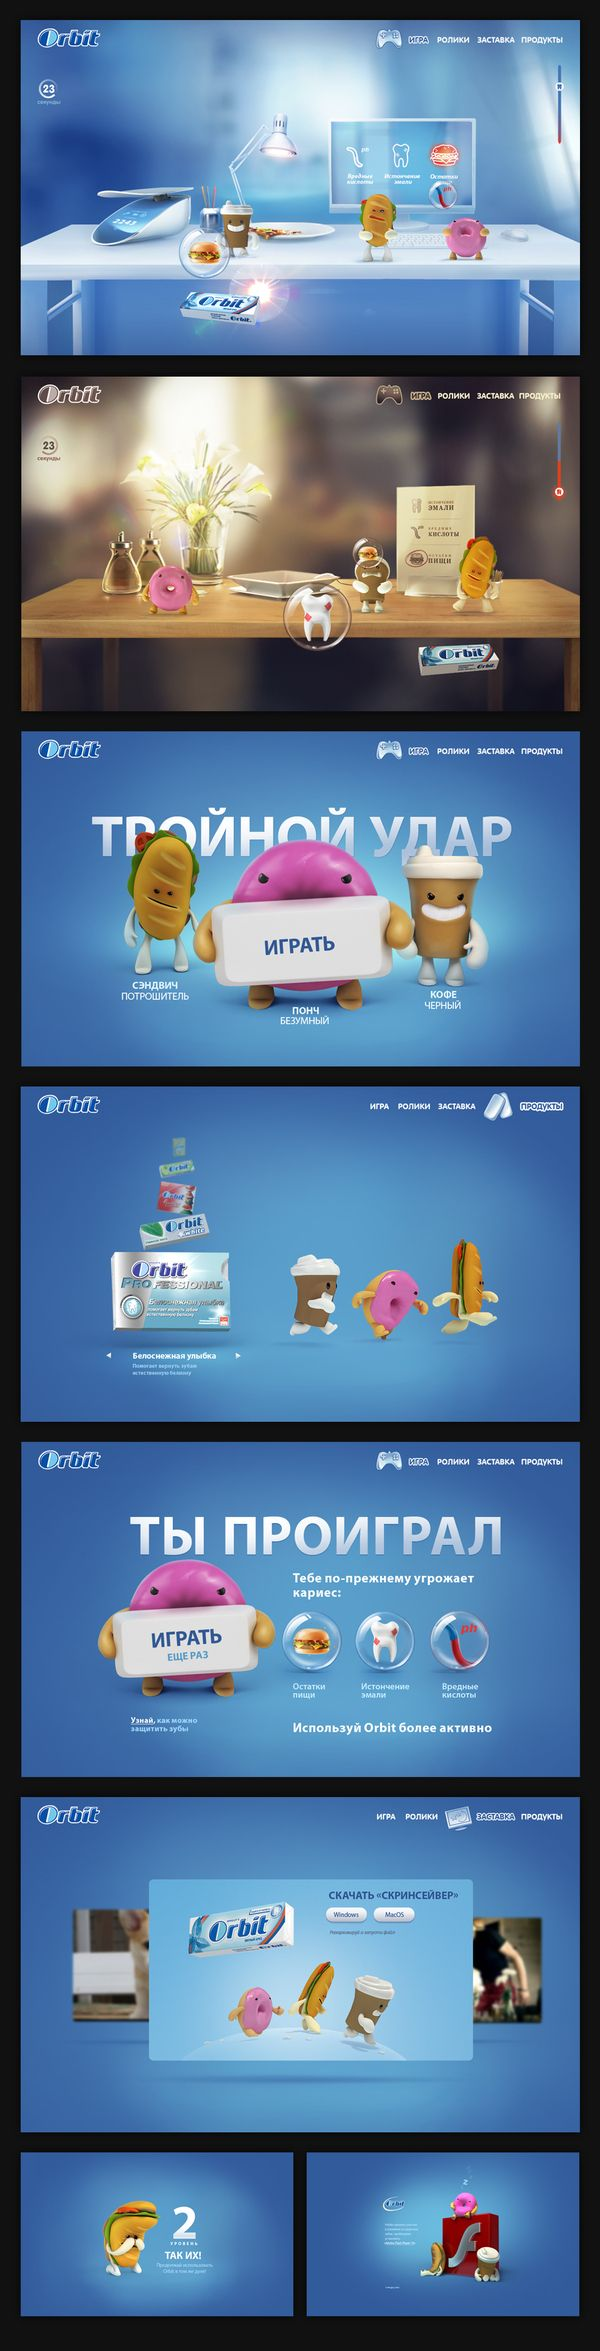 Orbit Foodcreatures by Ruslan Latypov, via Behance